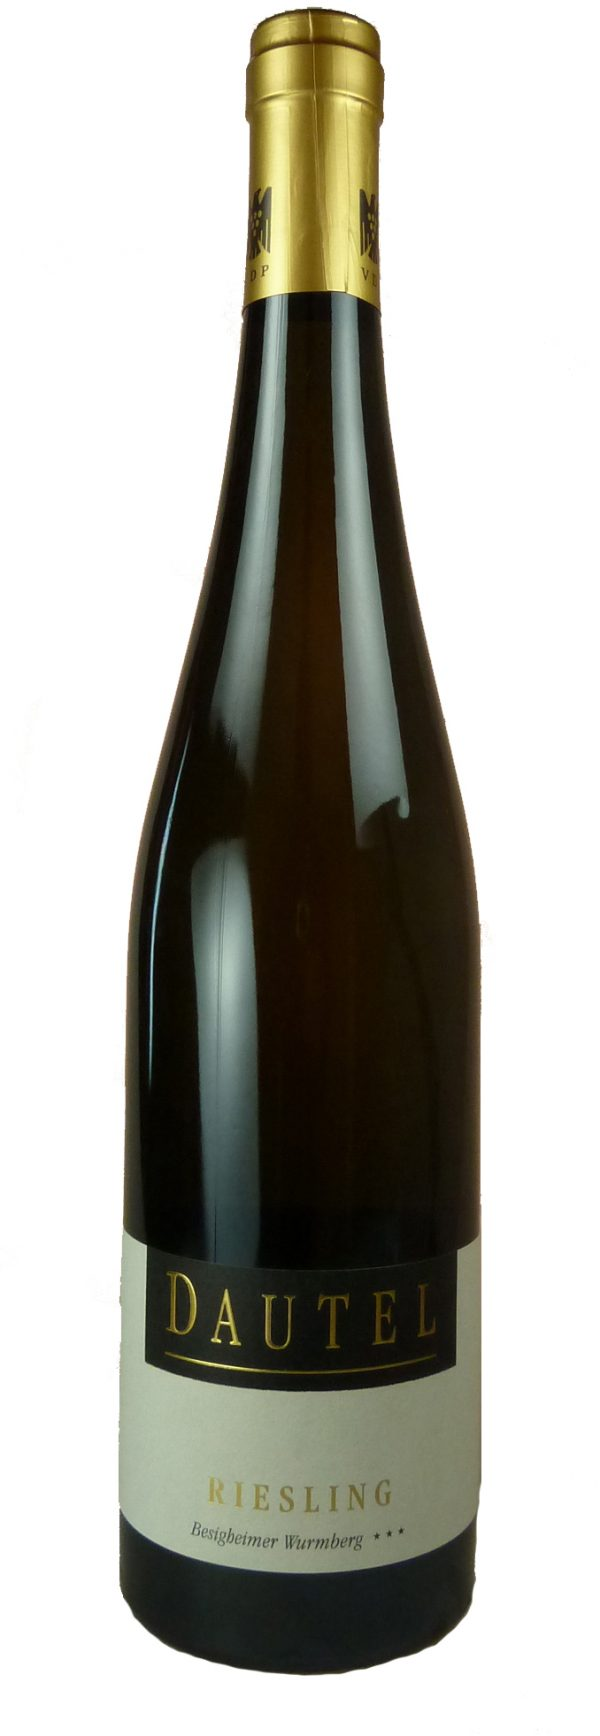 Besigheimer Wurmberg Riesling Qualitätswein trocken 2016